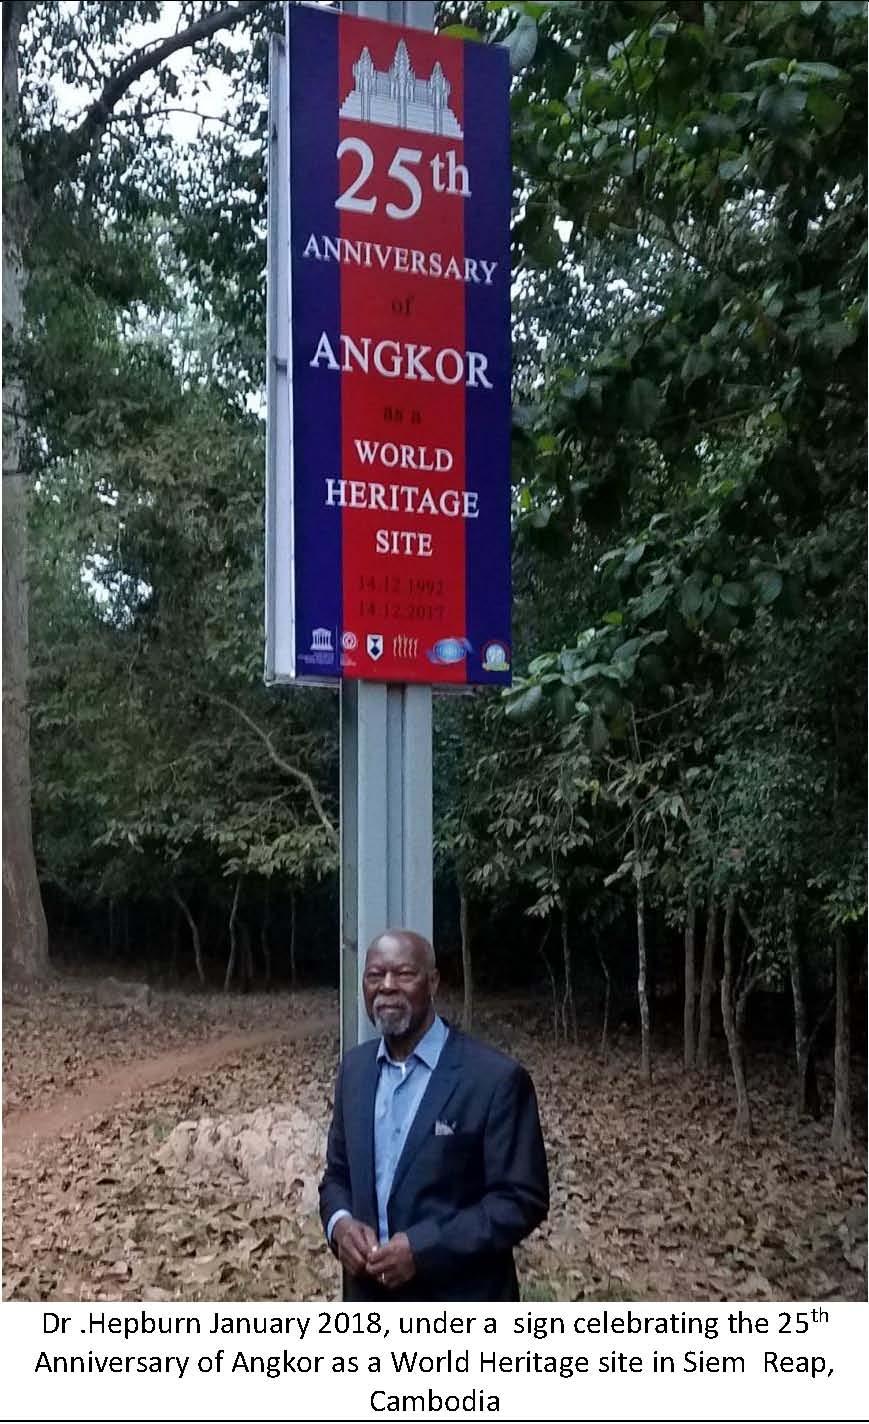 https://www.srichinmoypeacemeditationatun.org/wp-content/uploads/2018/01/2018-01Jan-20-31-davidson-hepburn-in-cambodia-with-banner.jpg